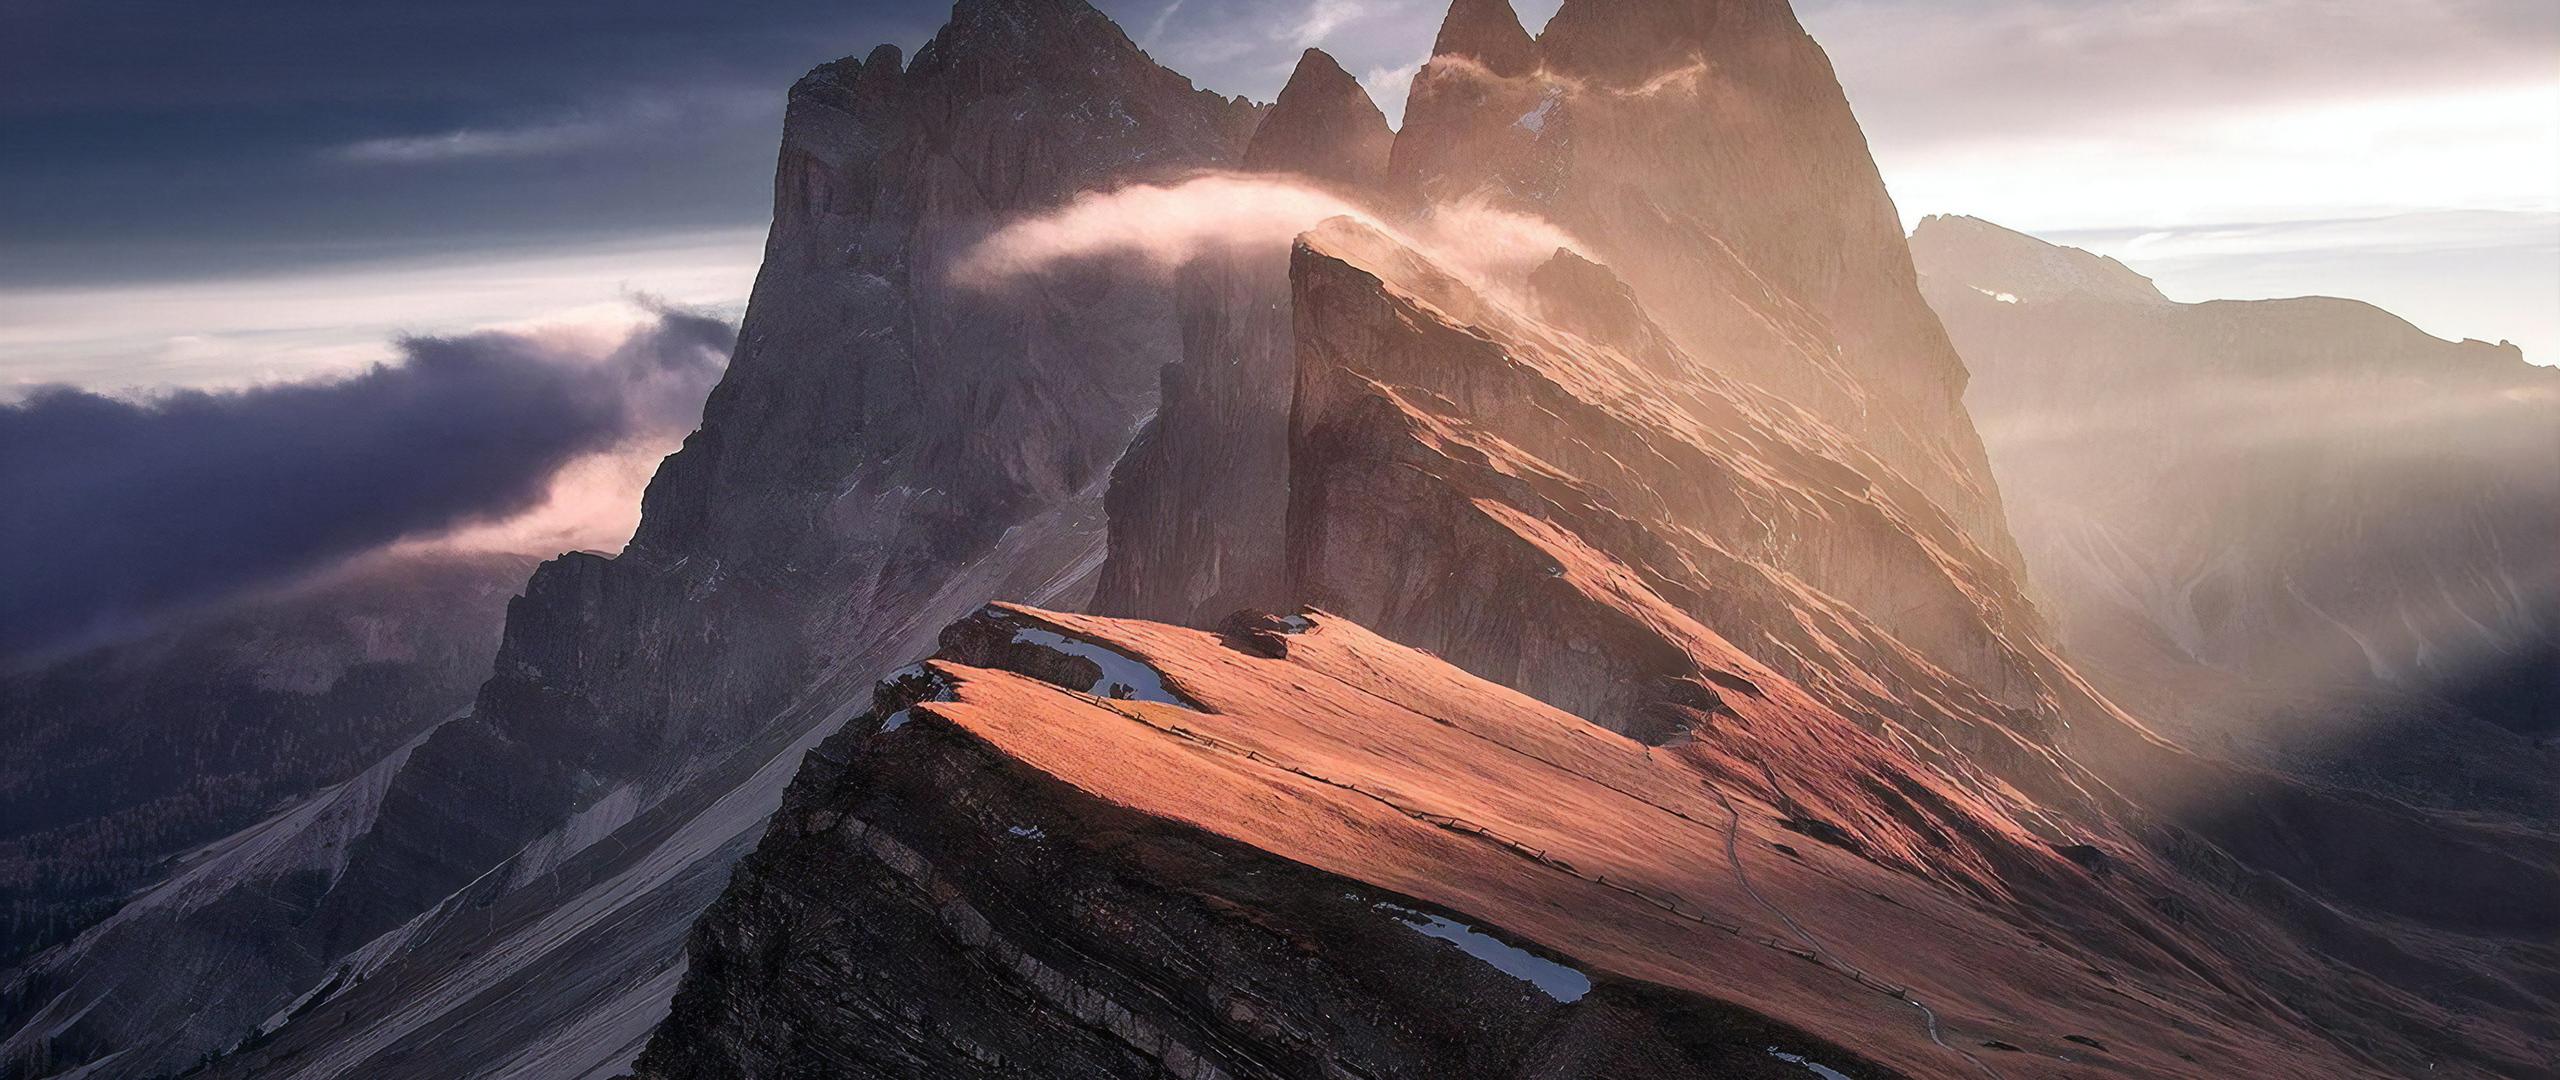 mountain-cliff-k6.jpg